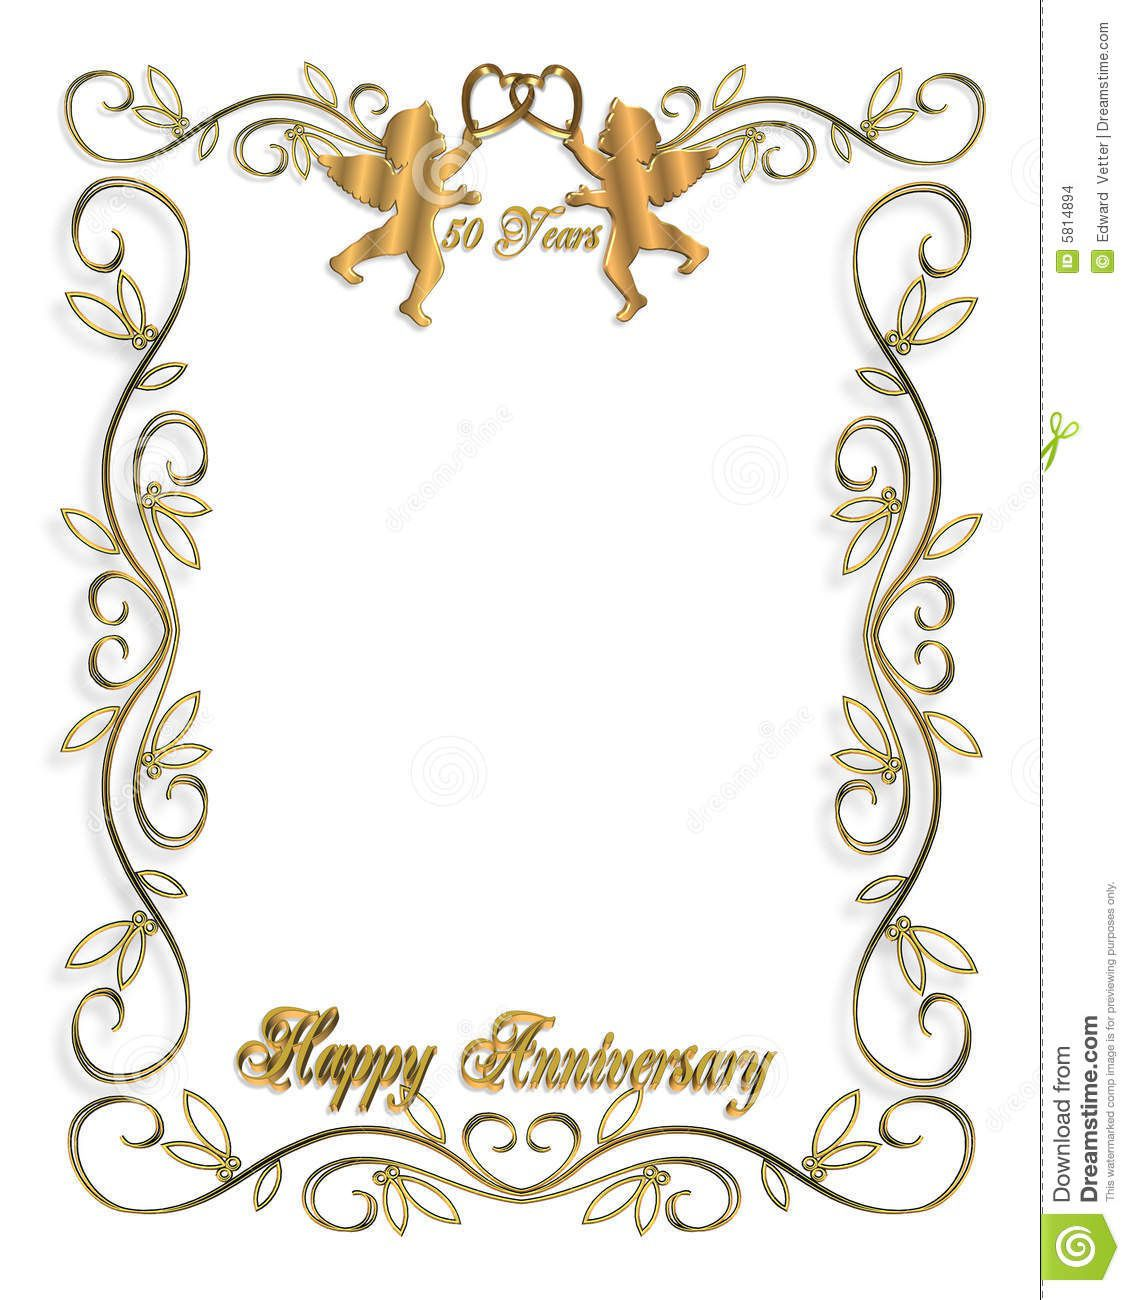 010 Formidable 50th Anniversary Invitation Template Free Download Sample  Golden WeddingFull